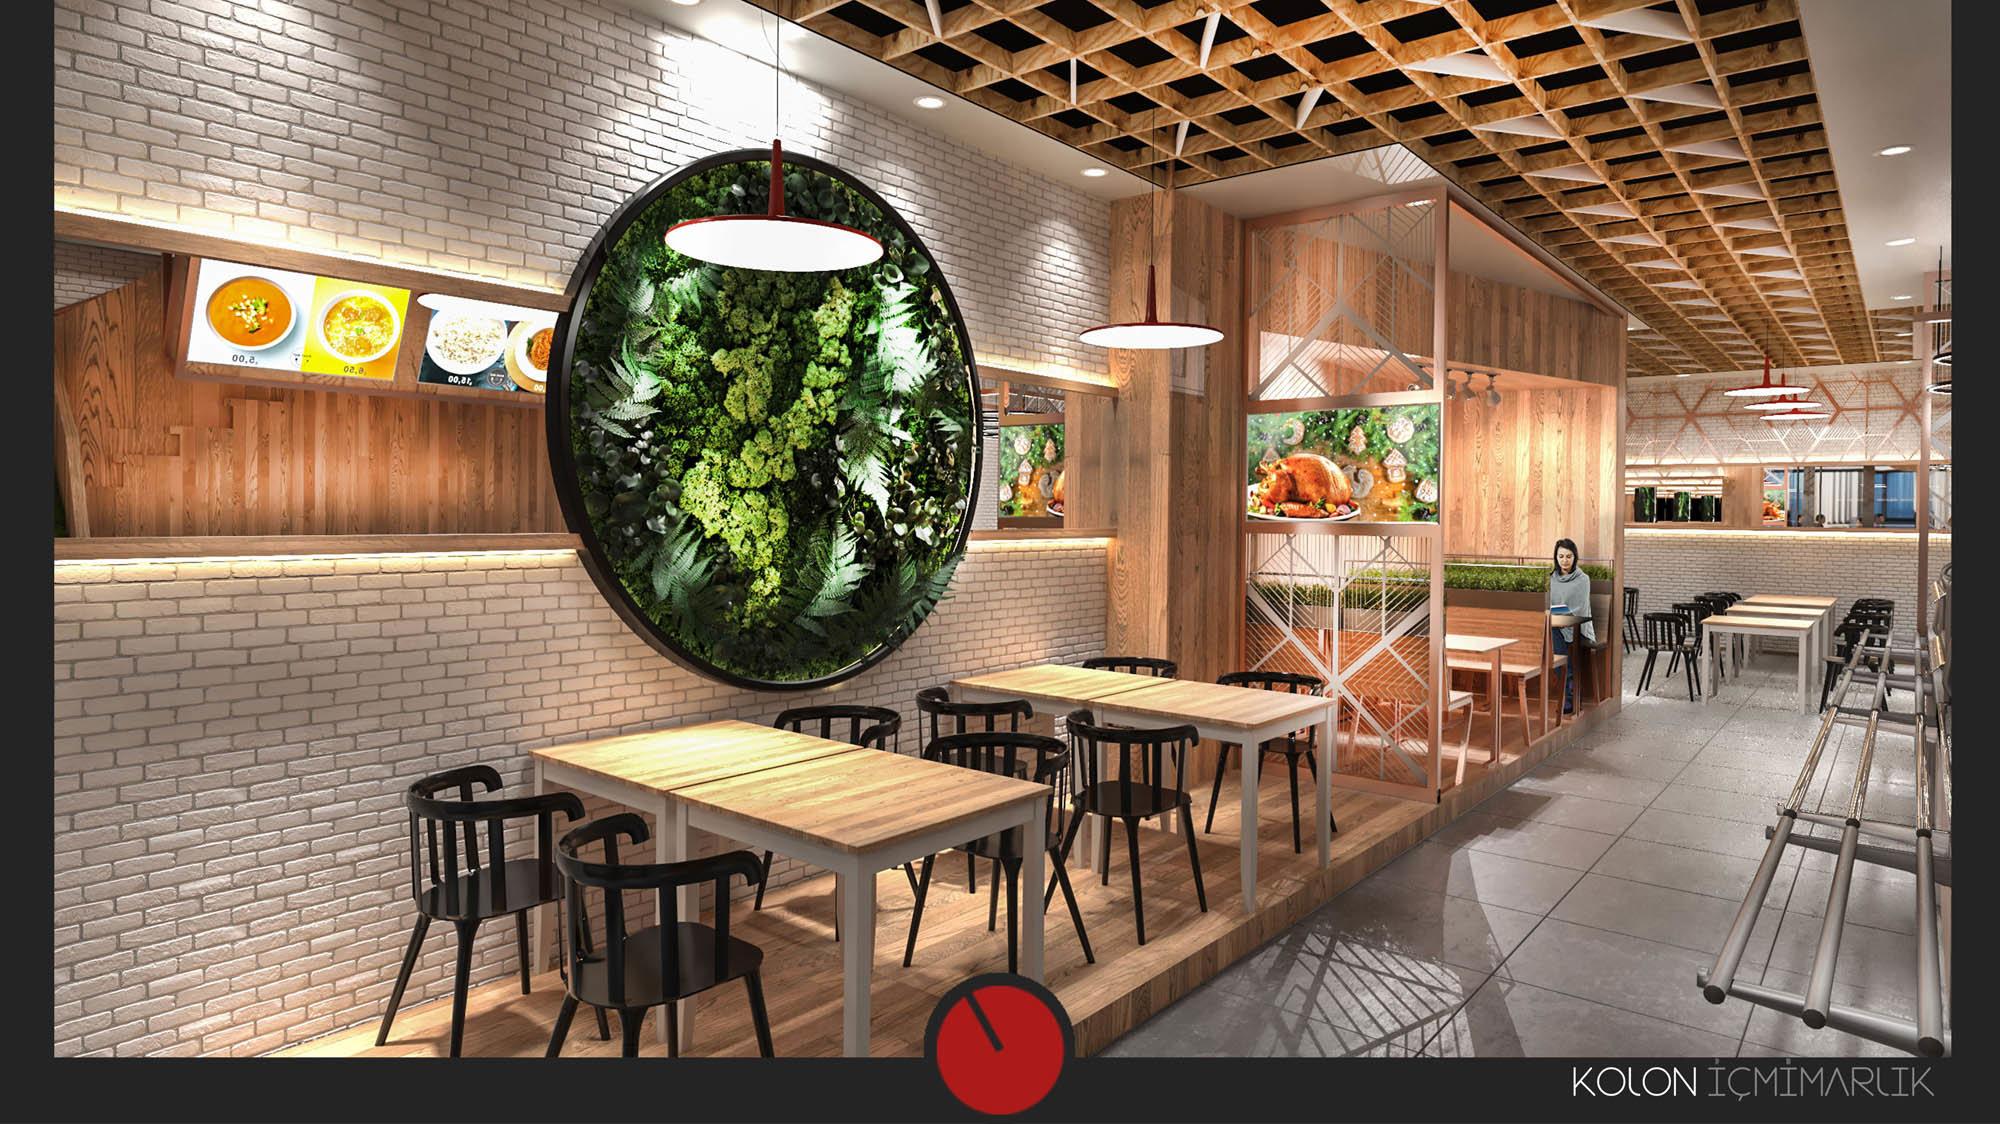 kolon-mimarlik-icmimarlik-ic-mimarlik-kafe tasarimi-kafe-icmimari-tasarimi-restoran-tasarimi-restoran-tasarimlari (2)